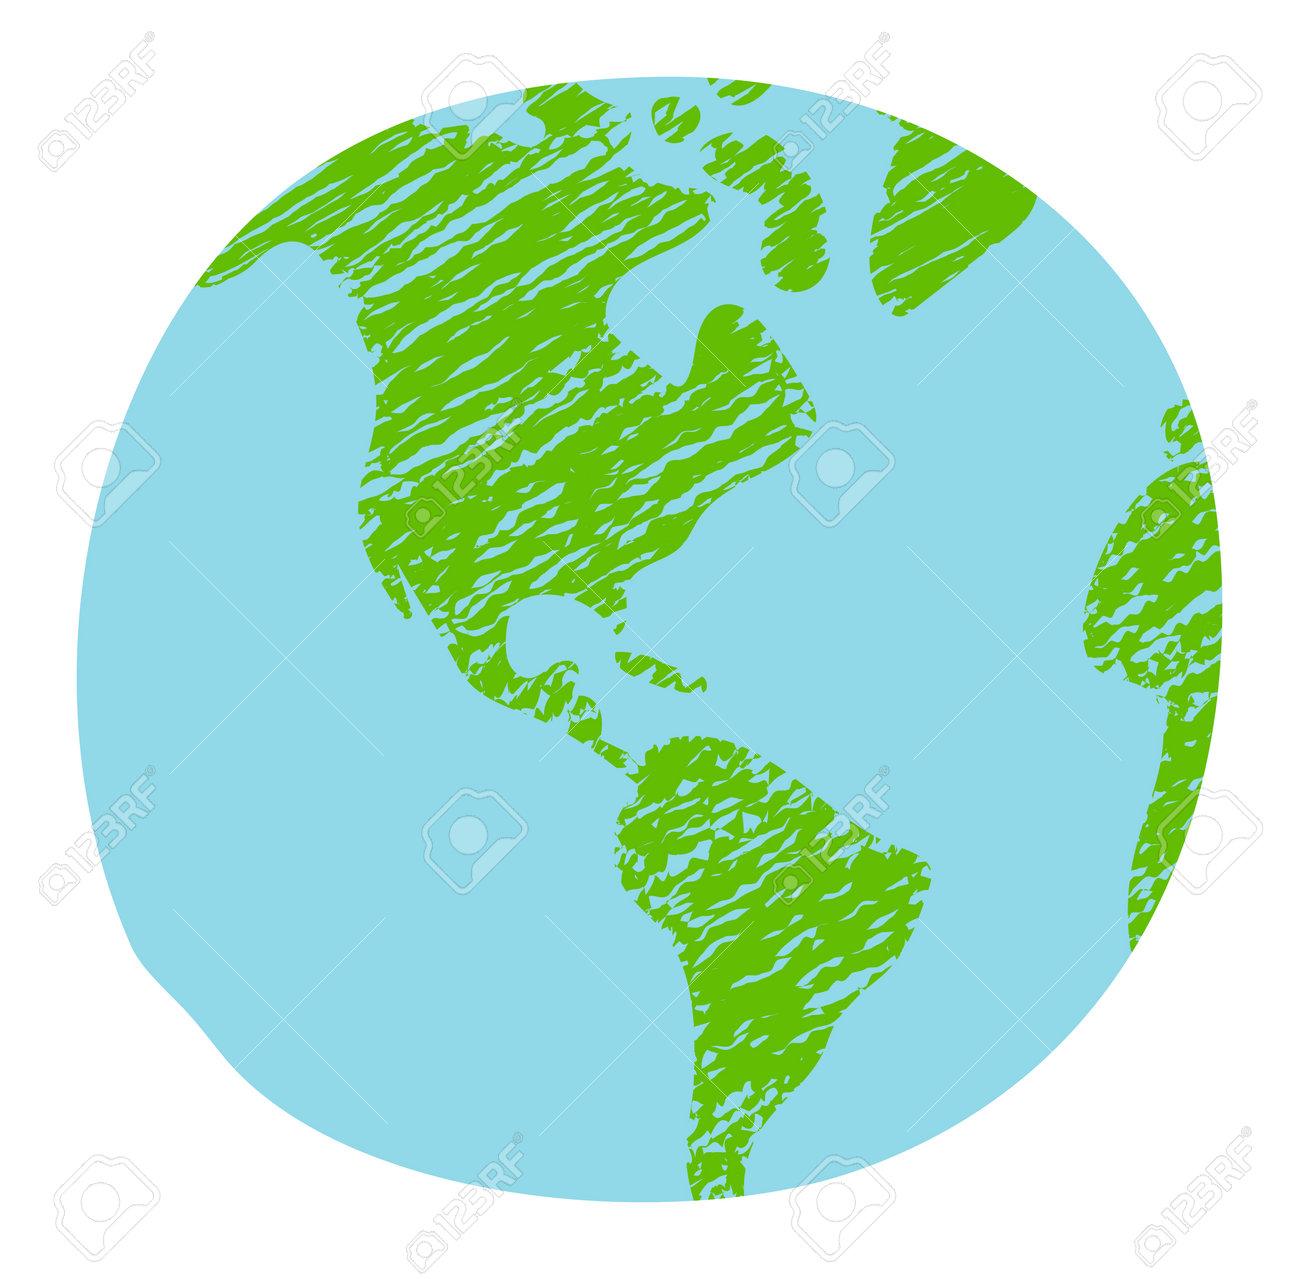 Chalked vector grunge earth (world map, globe) illustration - 169249615